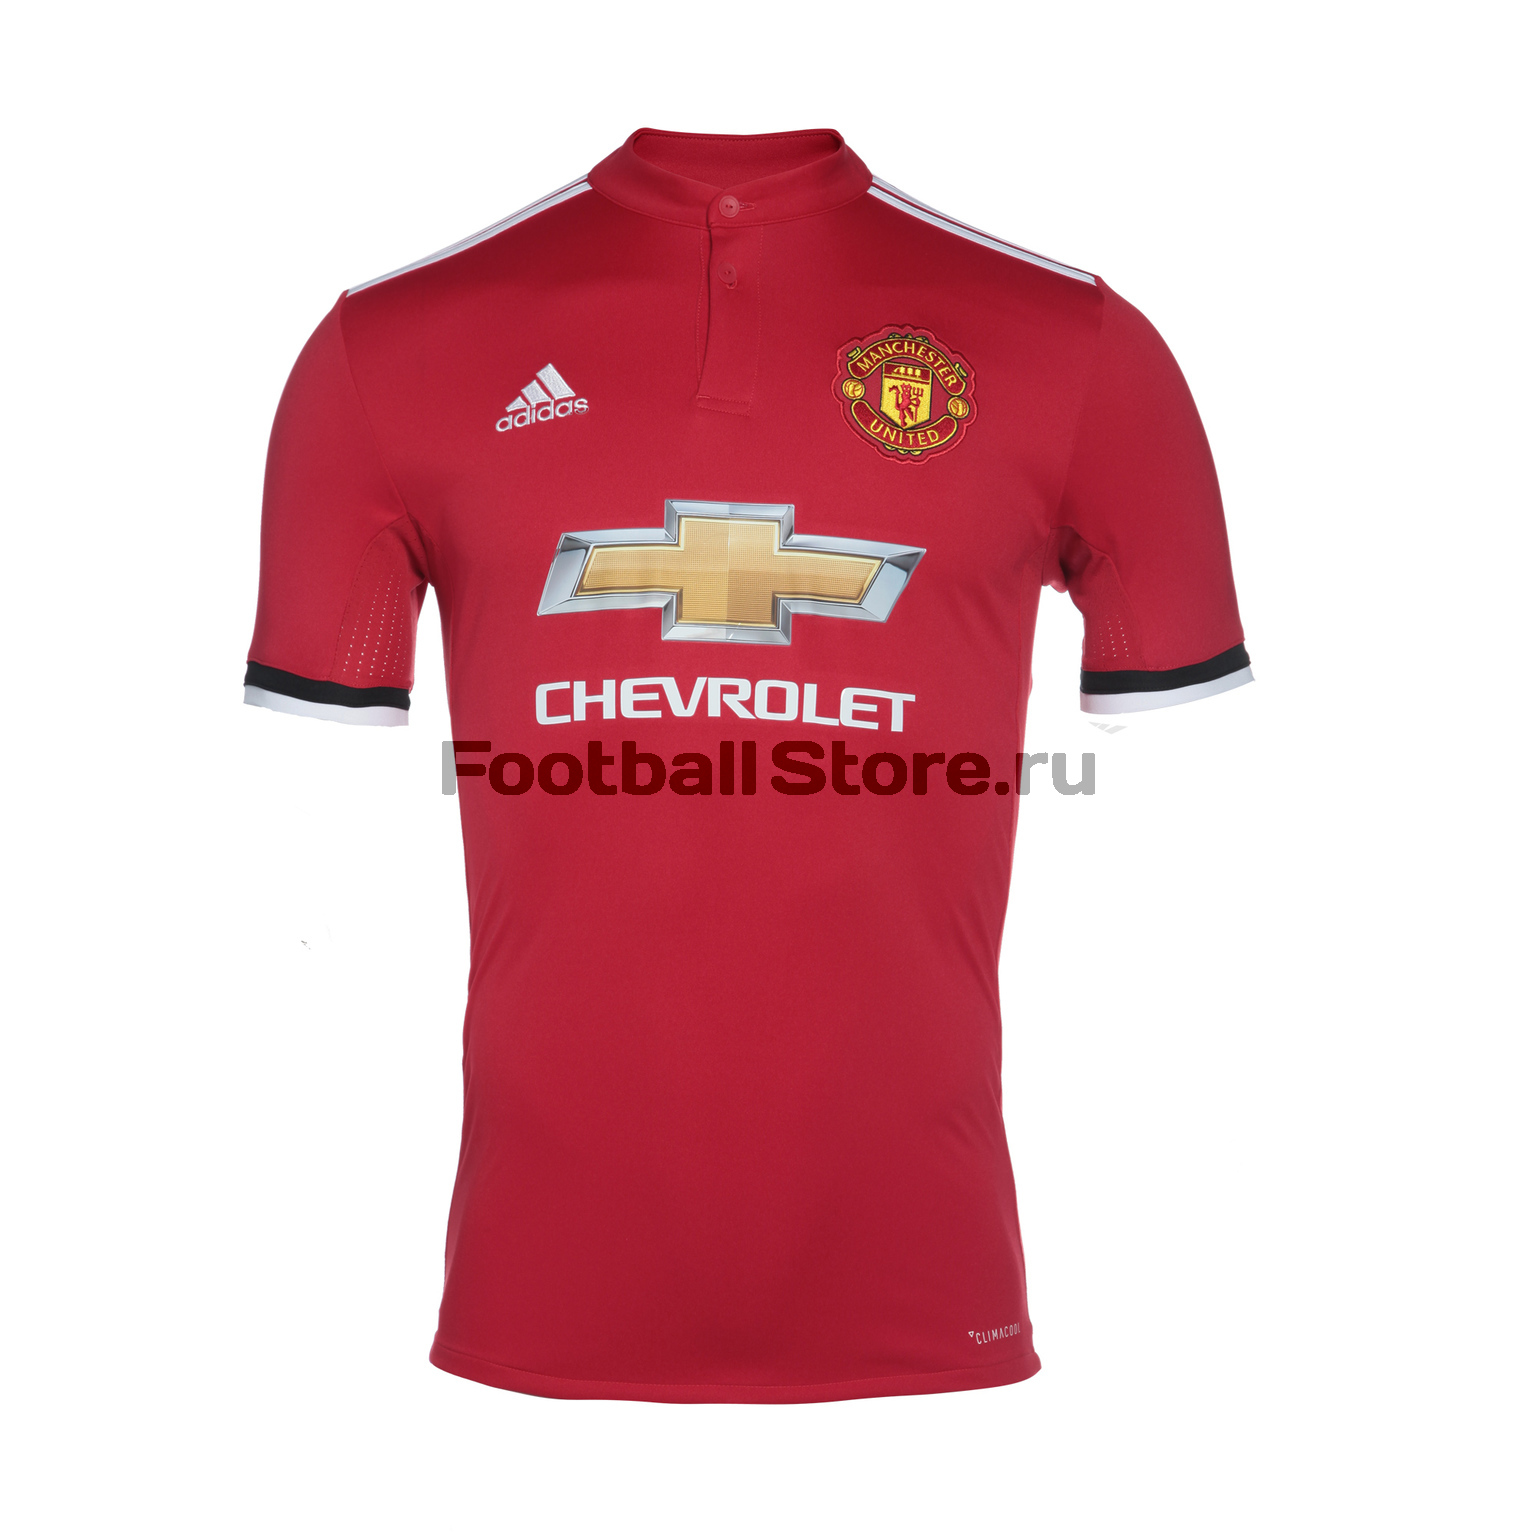 Футболка игровая Adidas Manchester United Home BS1214 цена